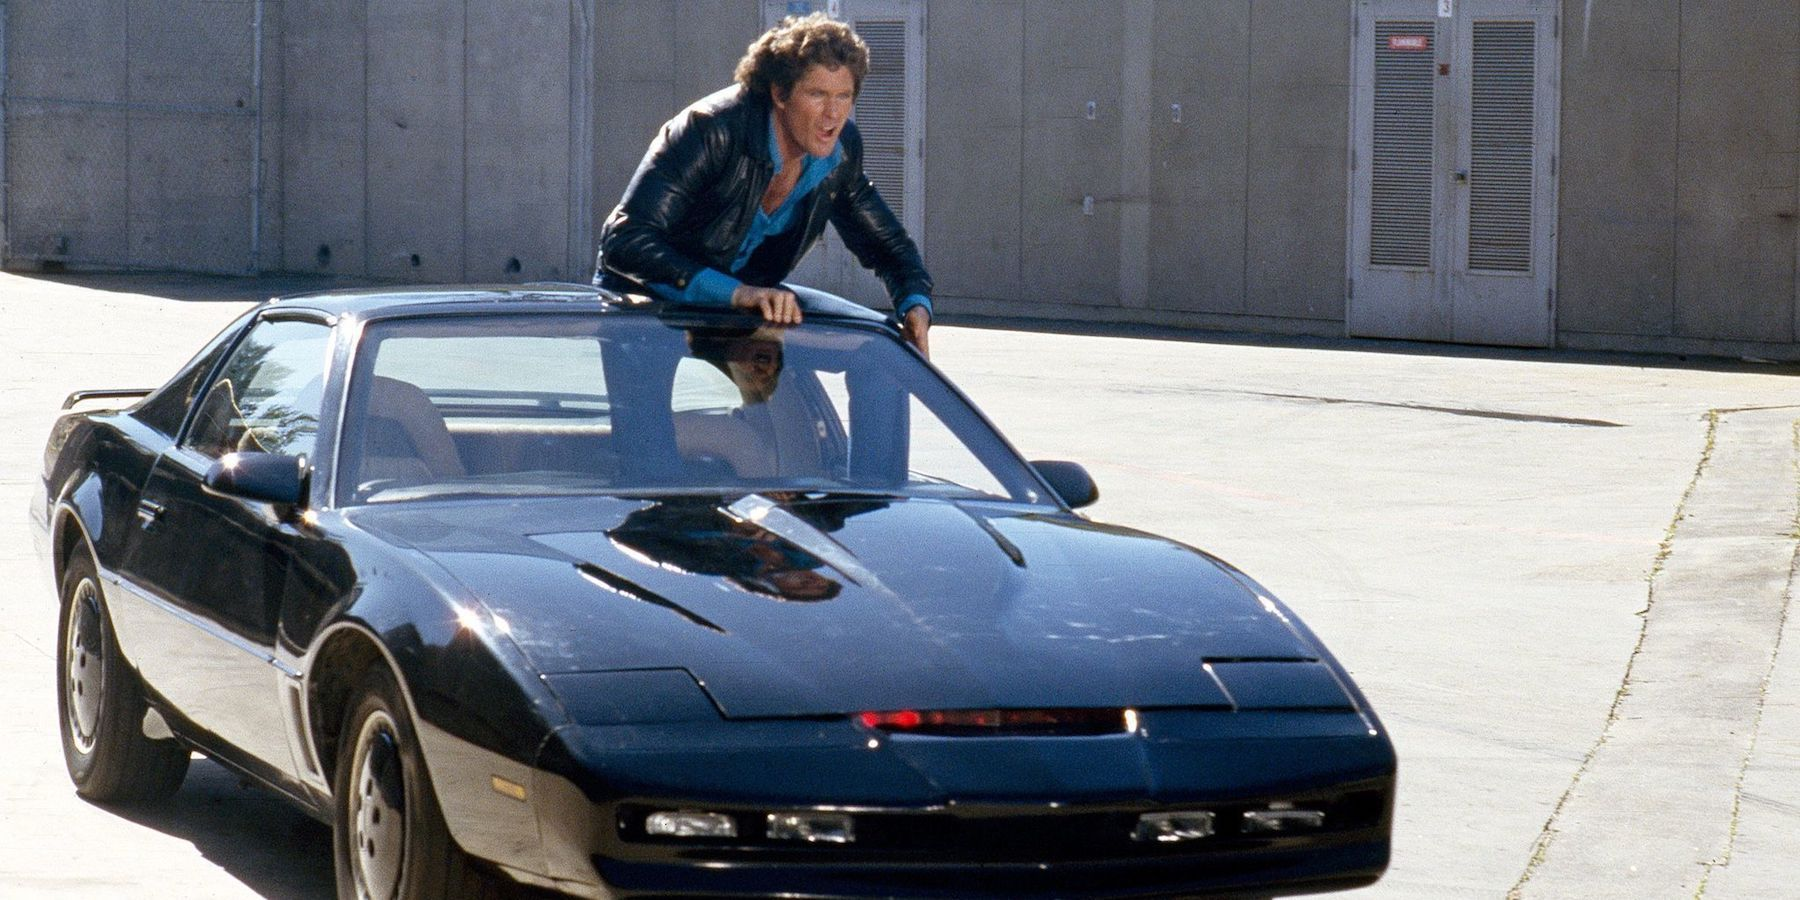 David Hasselhoff Wants Logan-Style Knight Rider